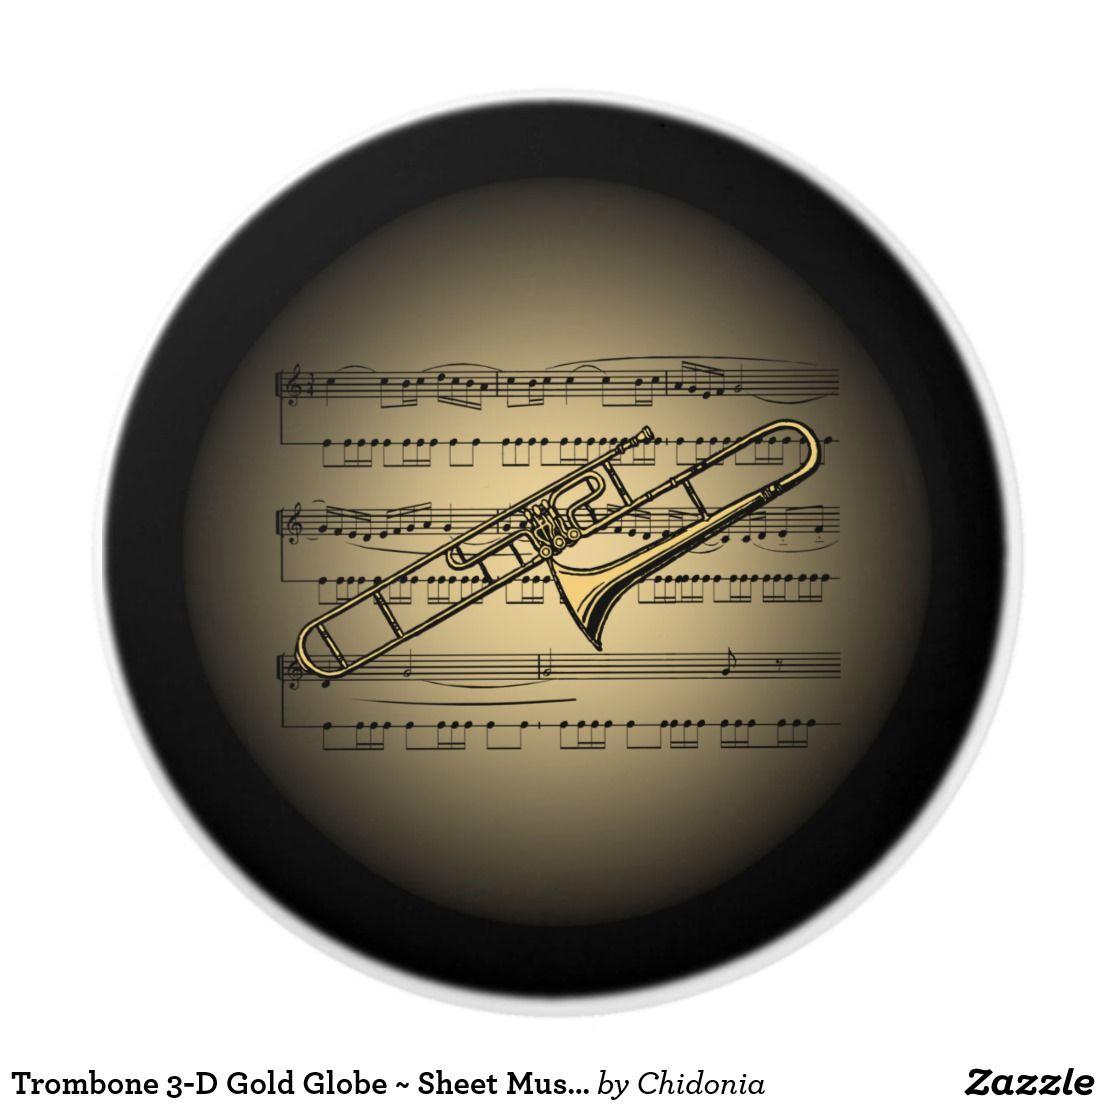 ed27dc8ec775f024b904bb642c6775a3 trombone 3 d gold globe ~ sheet music ~ black bg ~ ceramic knob